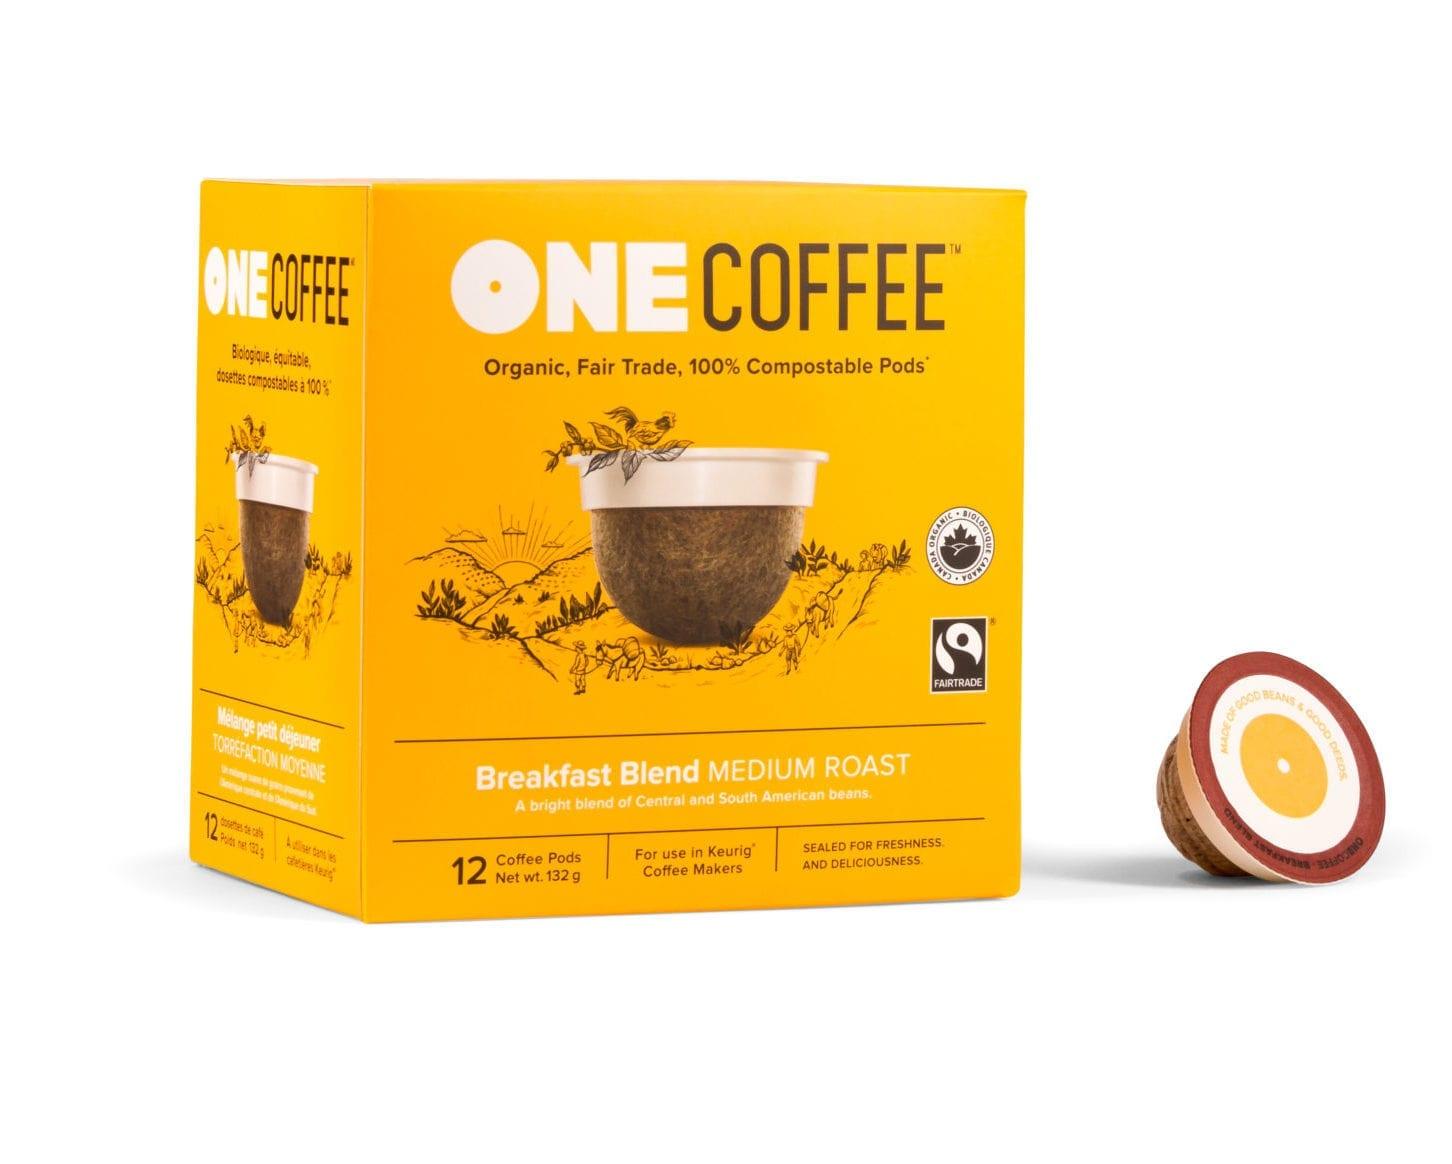 Box of OneCoffee Breakfast Blend